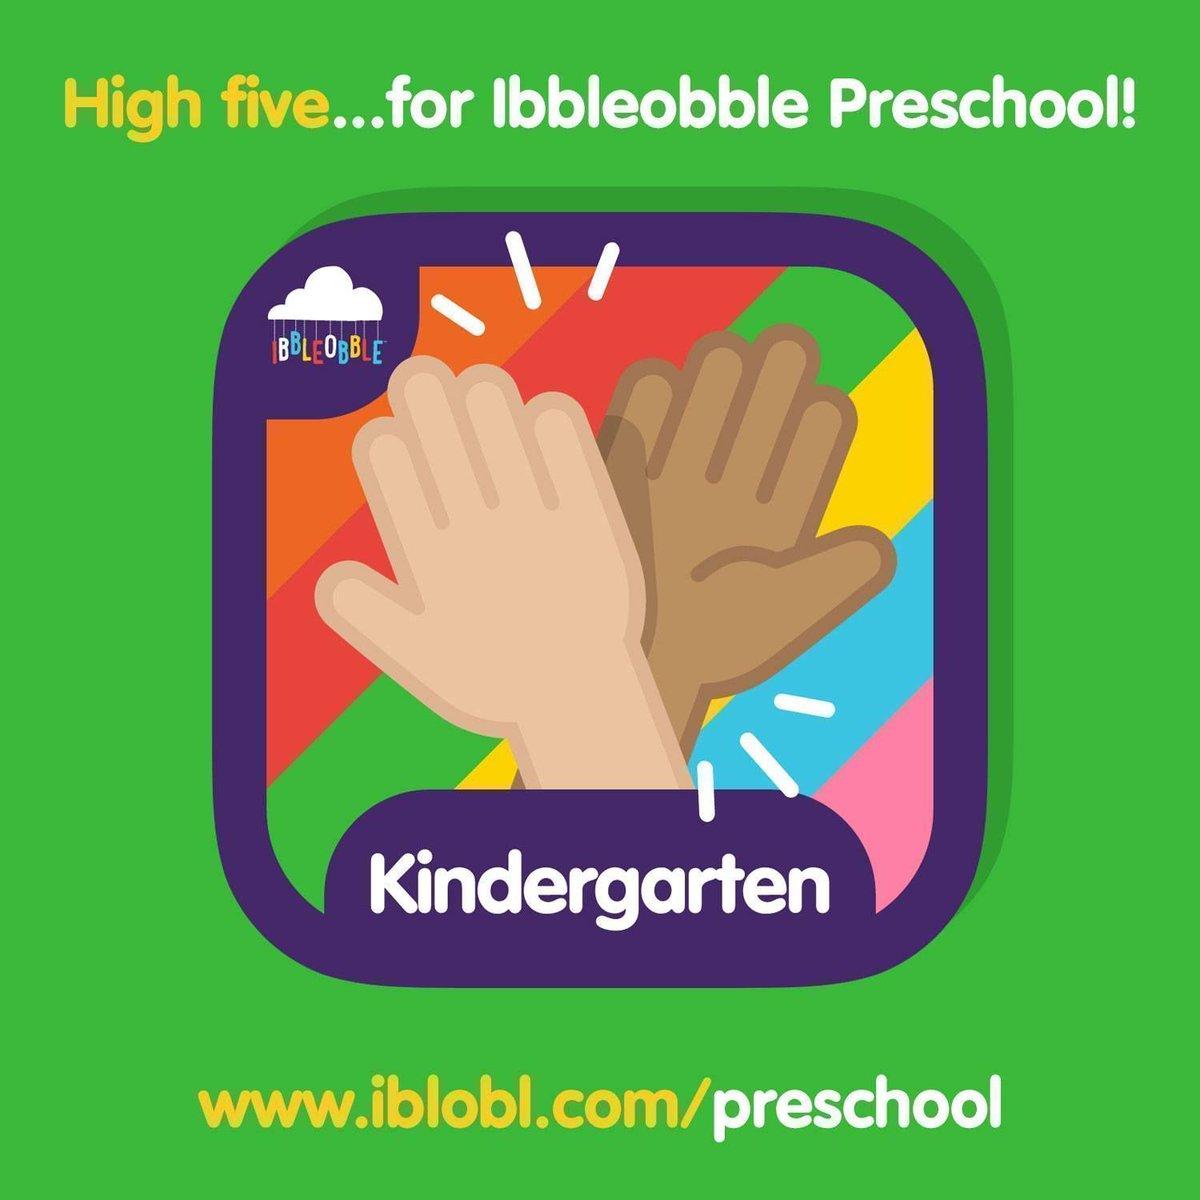 #HighFive for #Preschool #Educational #apps for #kids! 🙌     #Children #Toddlers #Words #Patterns #Learning #Learn #Tech #Teach #EdTech #Nursery #NurserySchool #Primary  #WednesdayMotivation #WednesdayThoughts #WorldChildrensDay